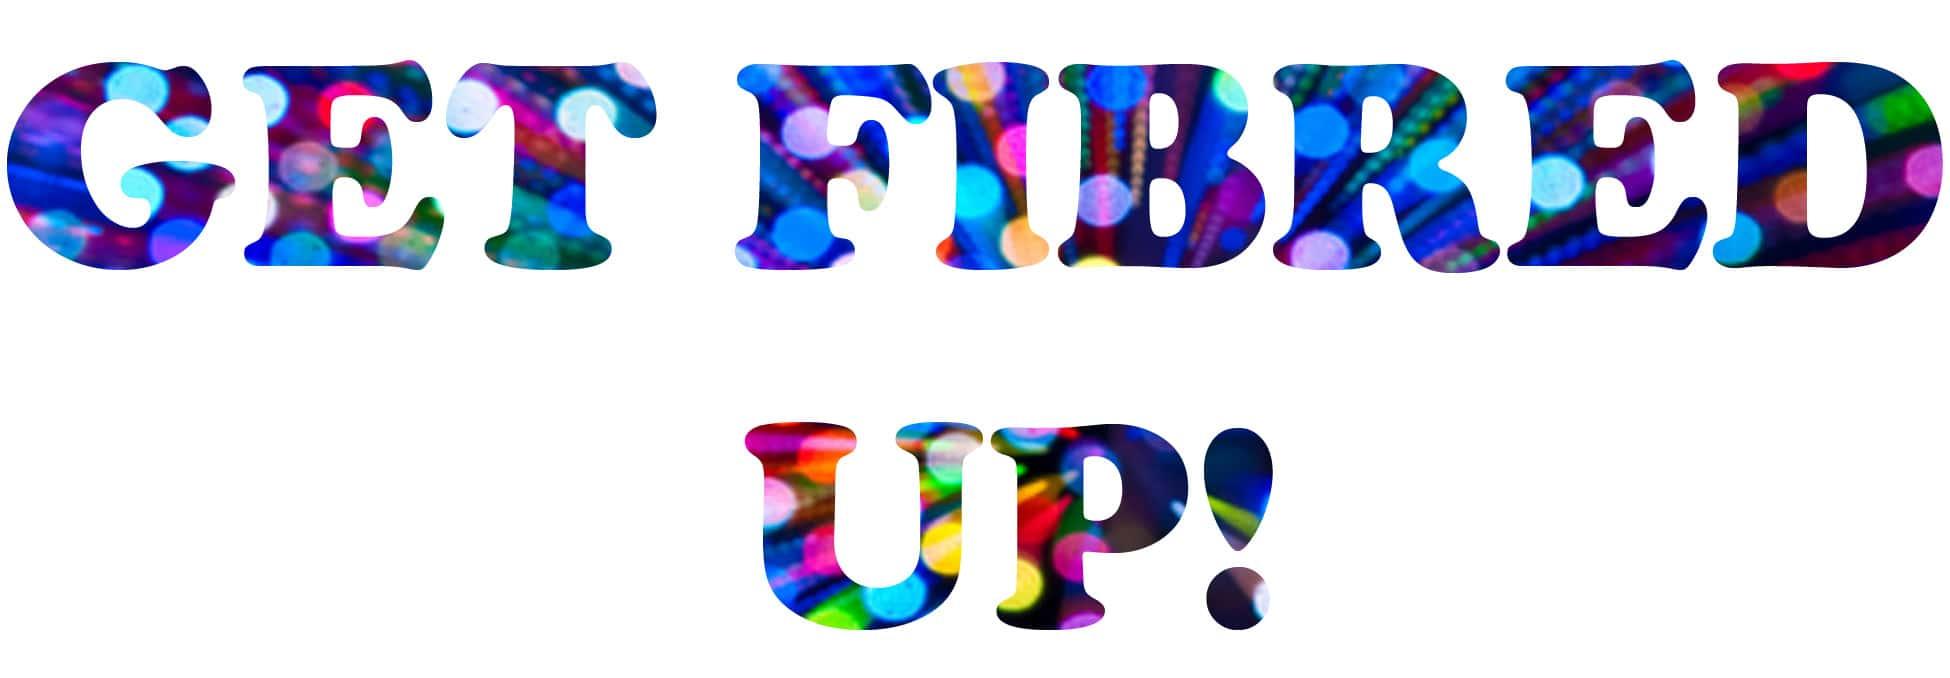 Get Fibred up